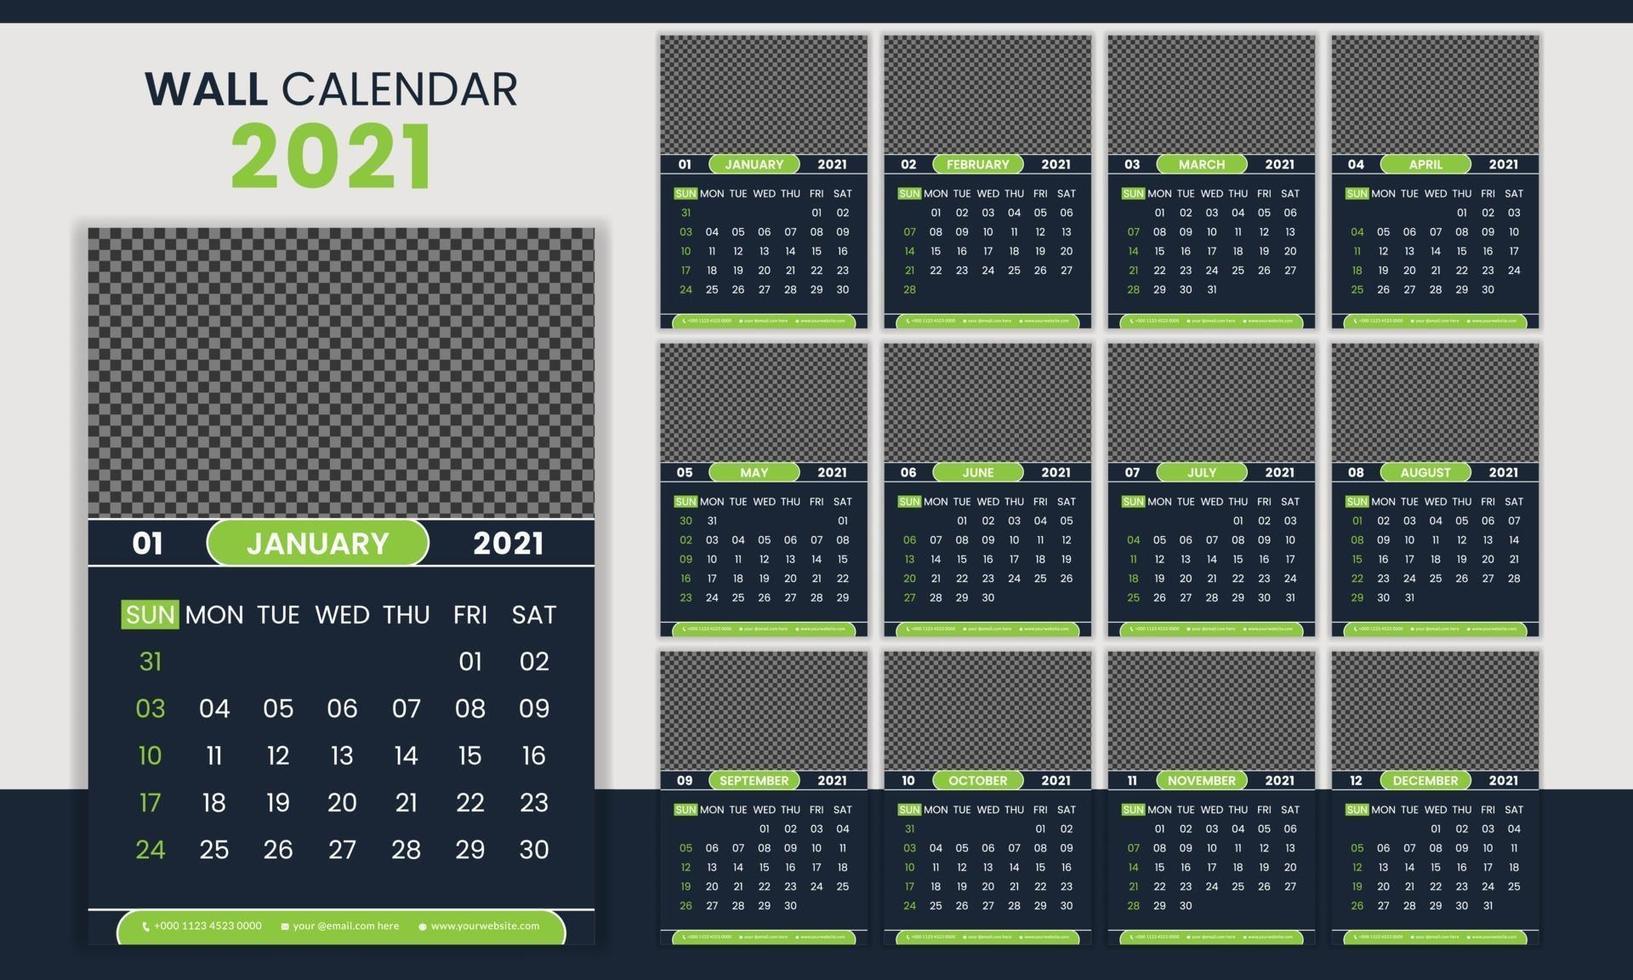 kreative Corporate Business Wandkalender Vorlage 2021 vektor